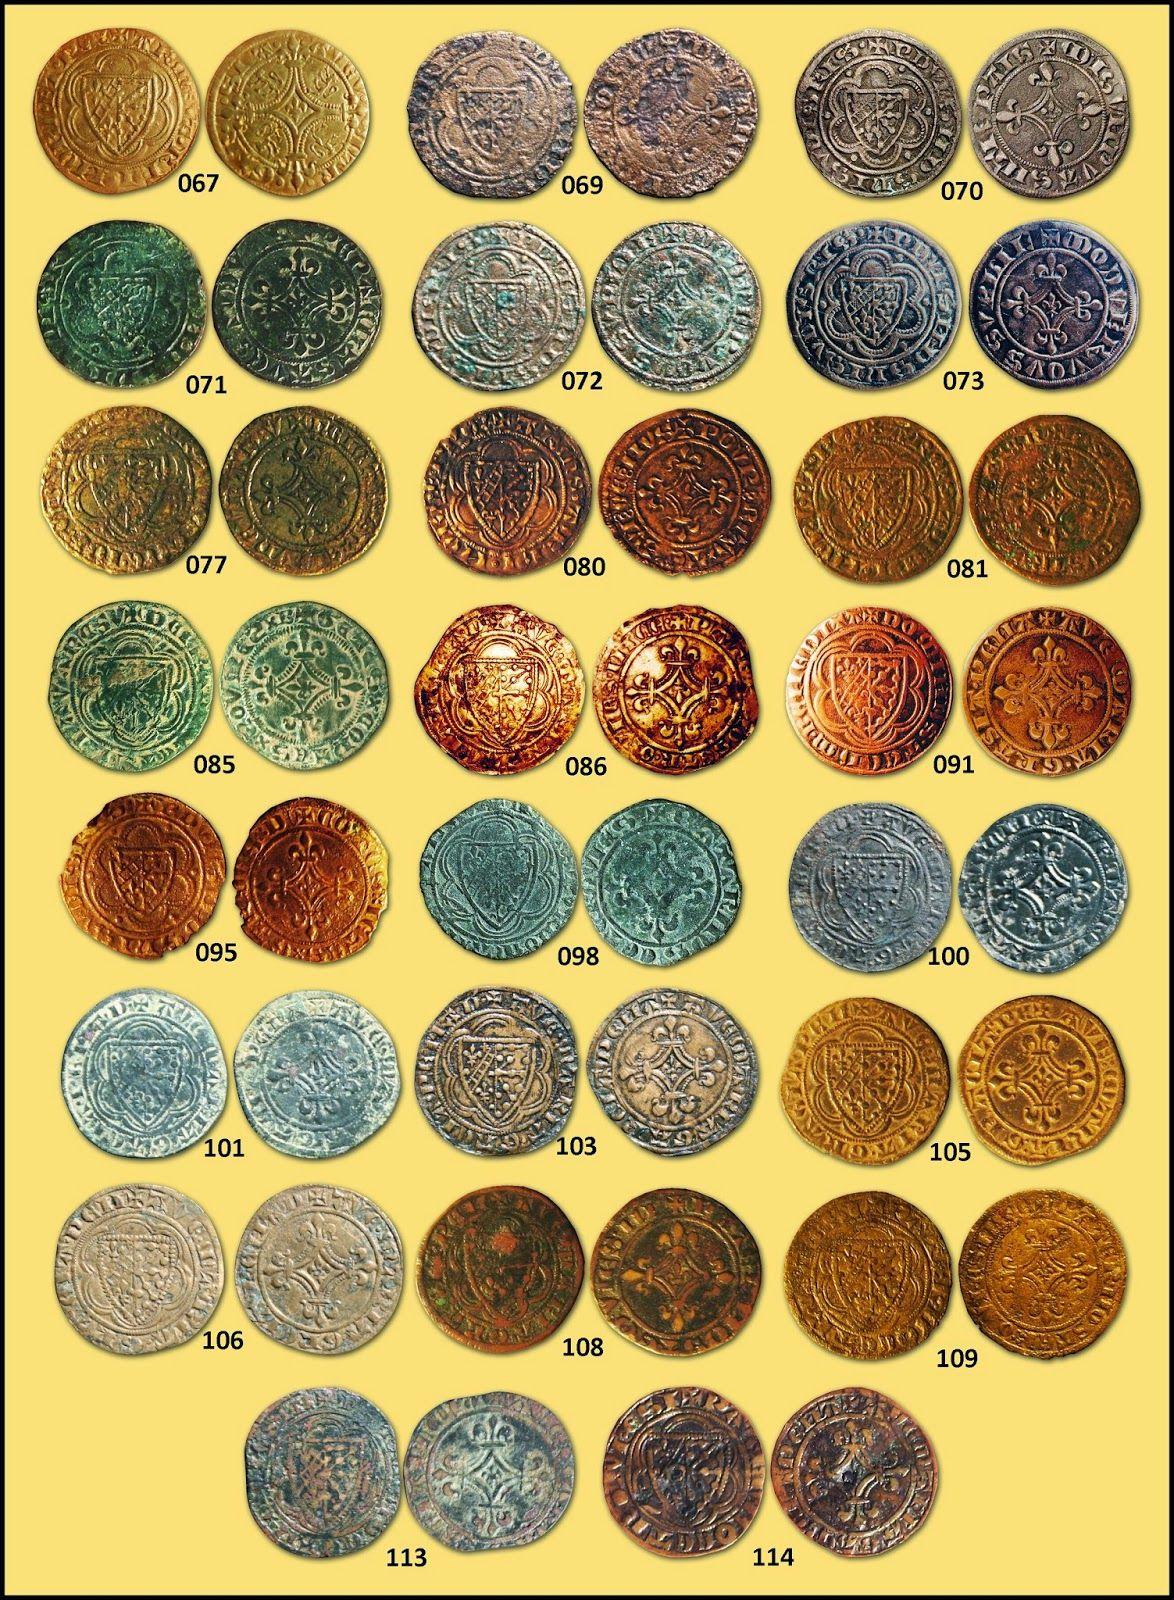 Numisarchives. Numismatic. Jetons. Navarre: Jetones con escudo dimidiado Evreux/Navarra, y cruz del reverso arqueada.